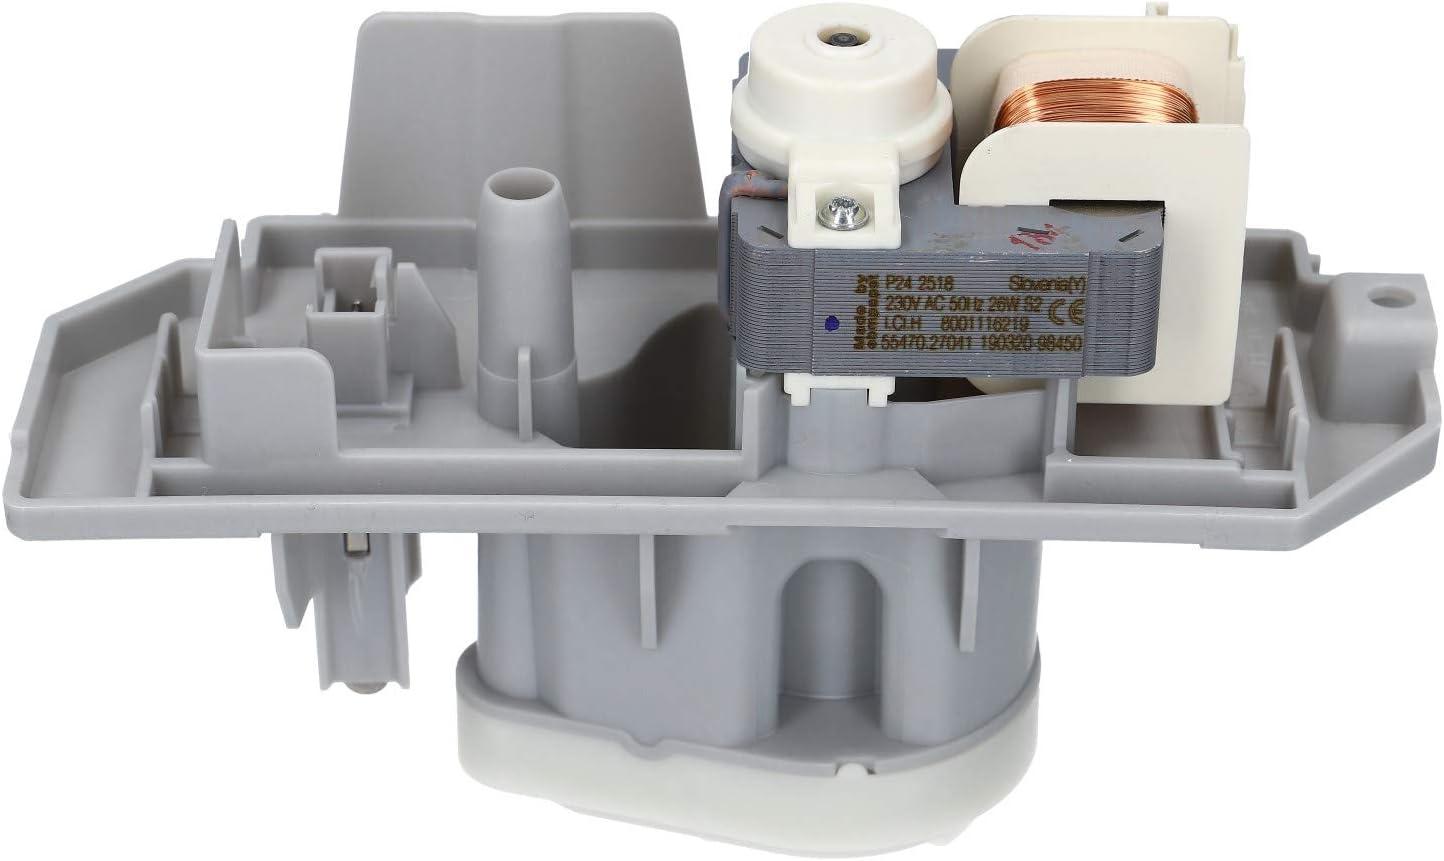 43,80 €//1l BOSCH Siemens per la cura per pompe di calore-Asciugatrice 00311805 311805